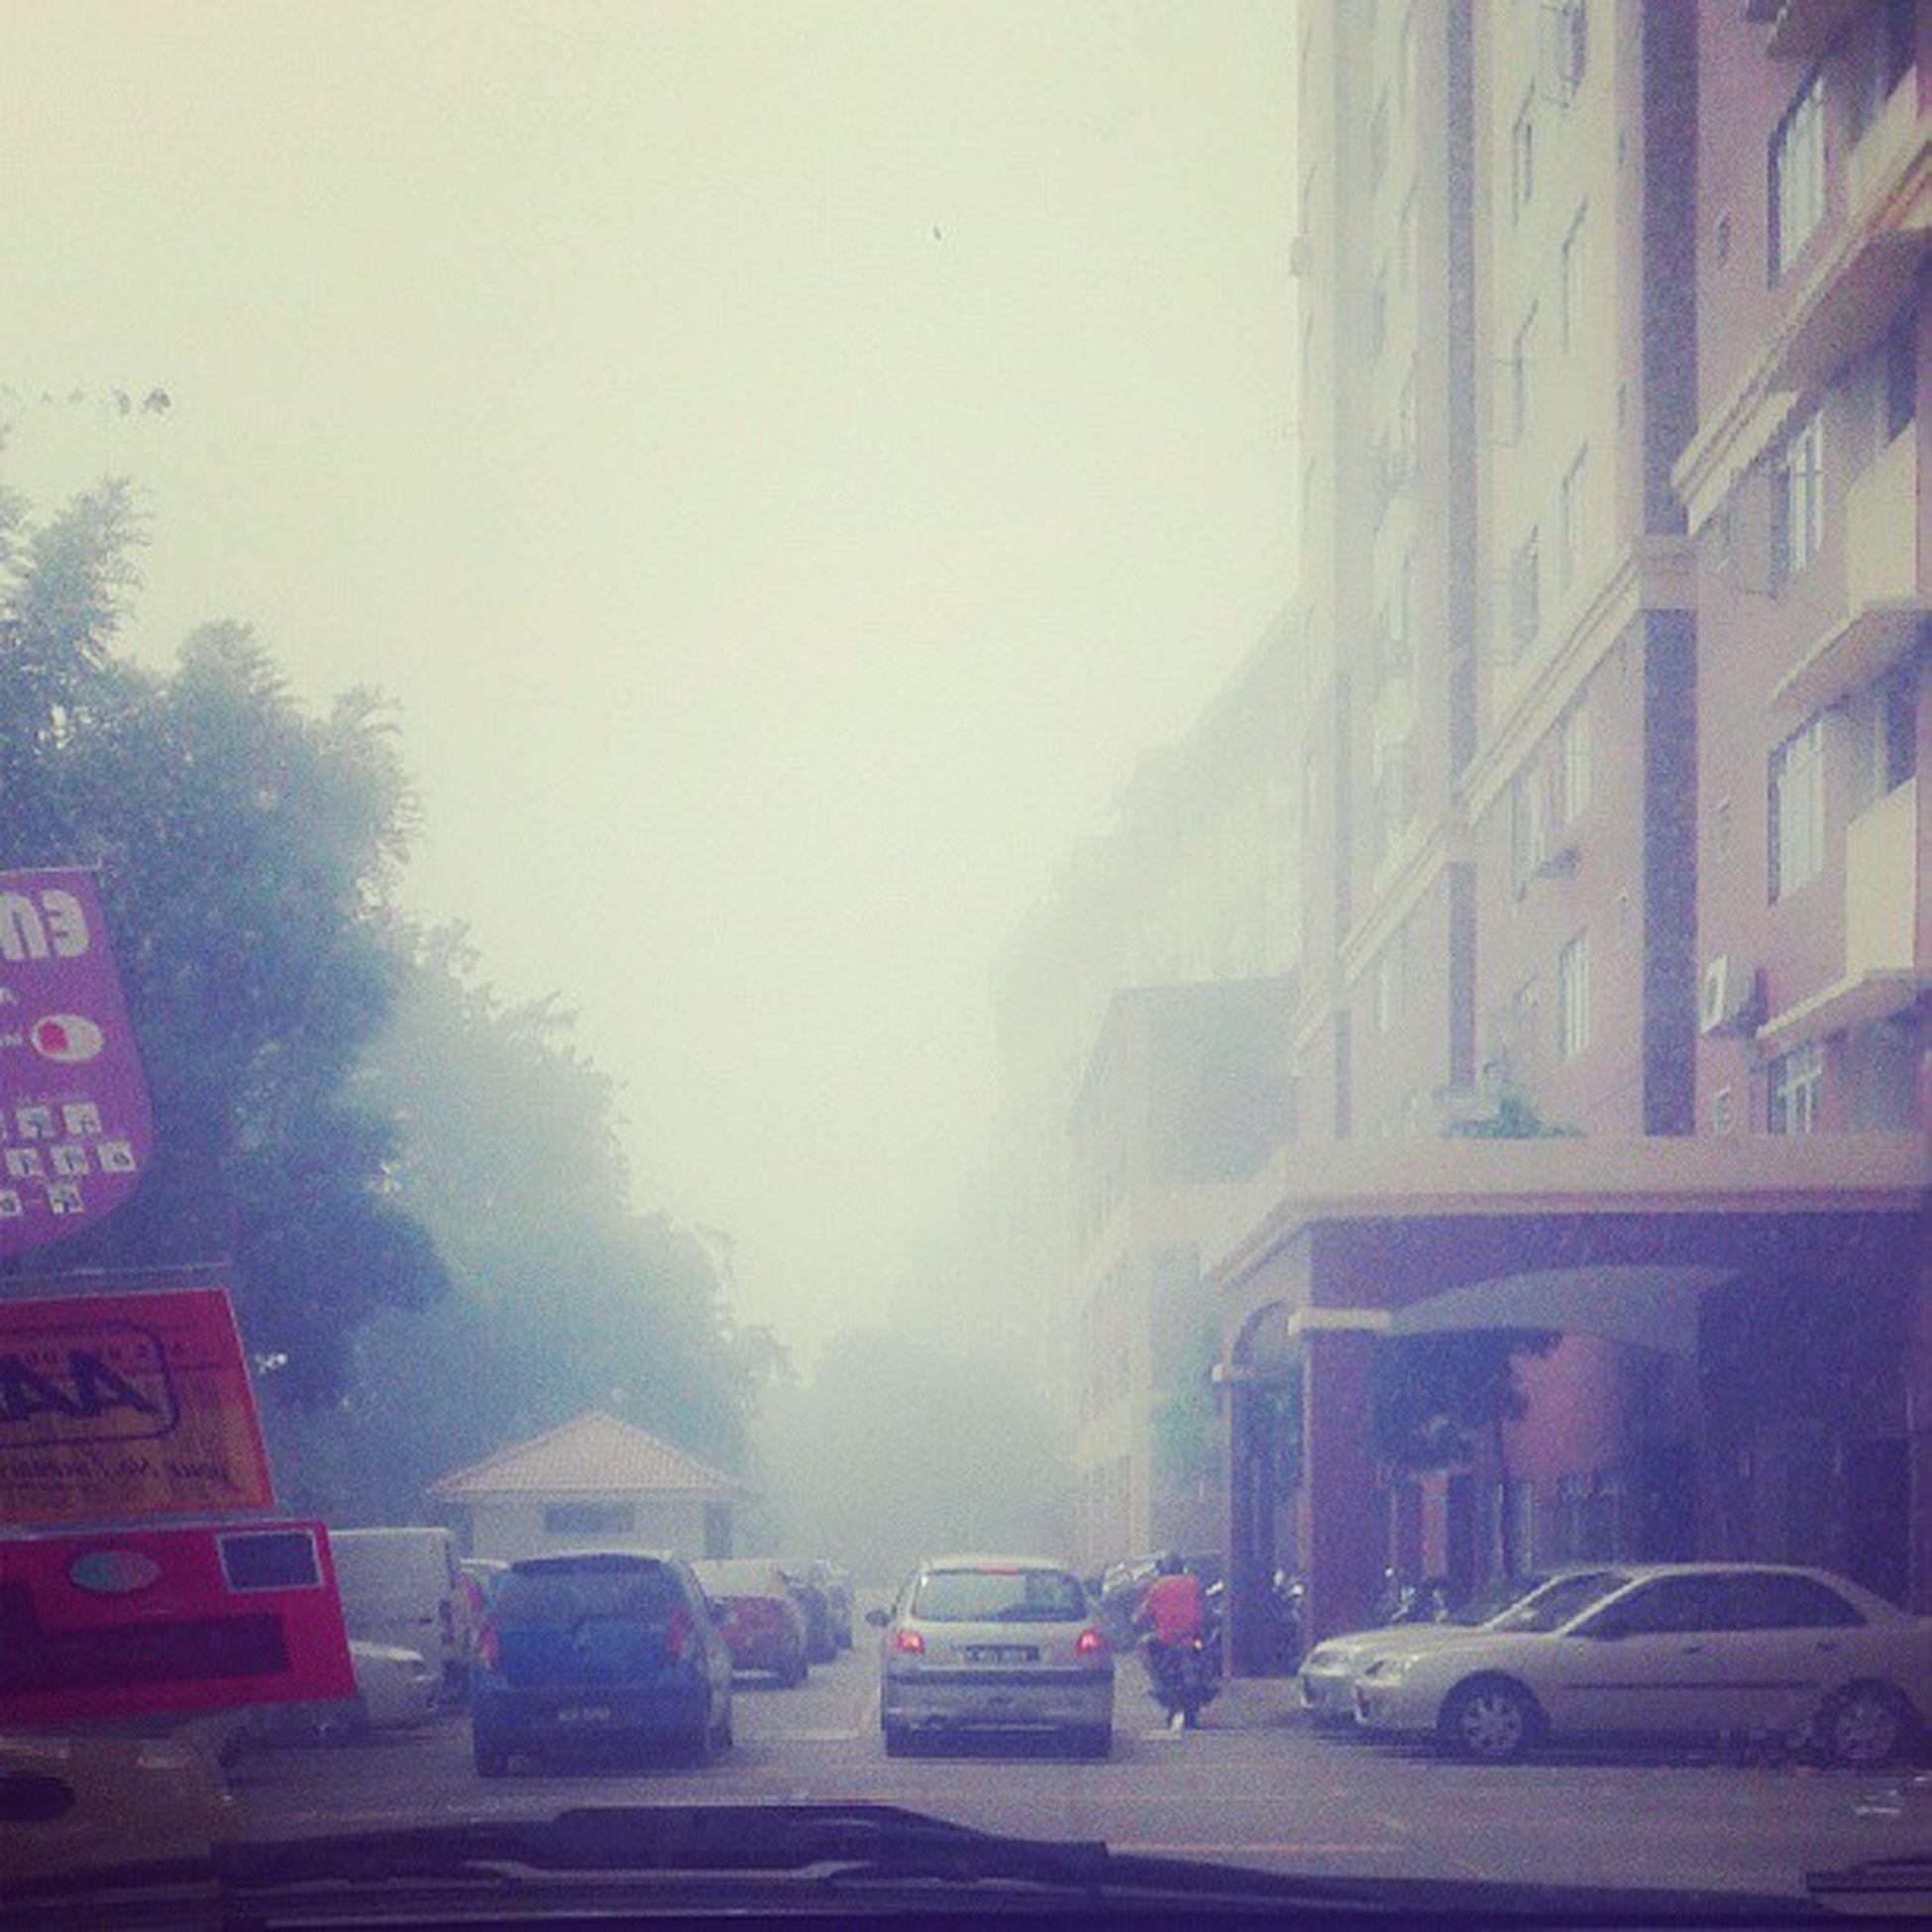 Haze owhh haze..Jerebu Haze Terrible Mentaricourt malaysiapetalingjaya